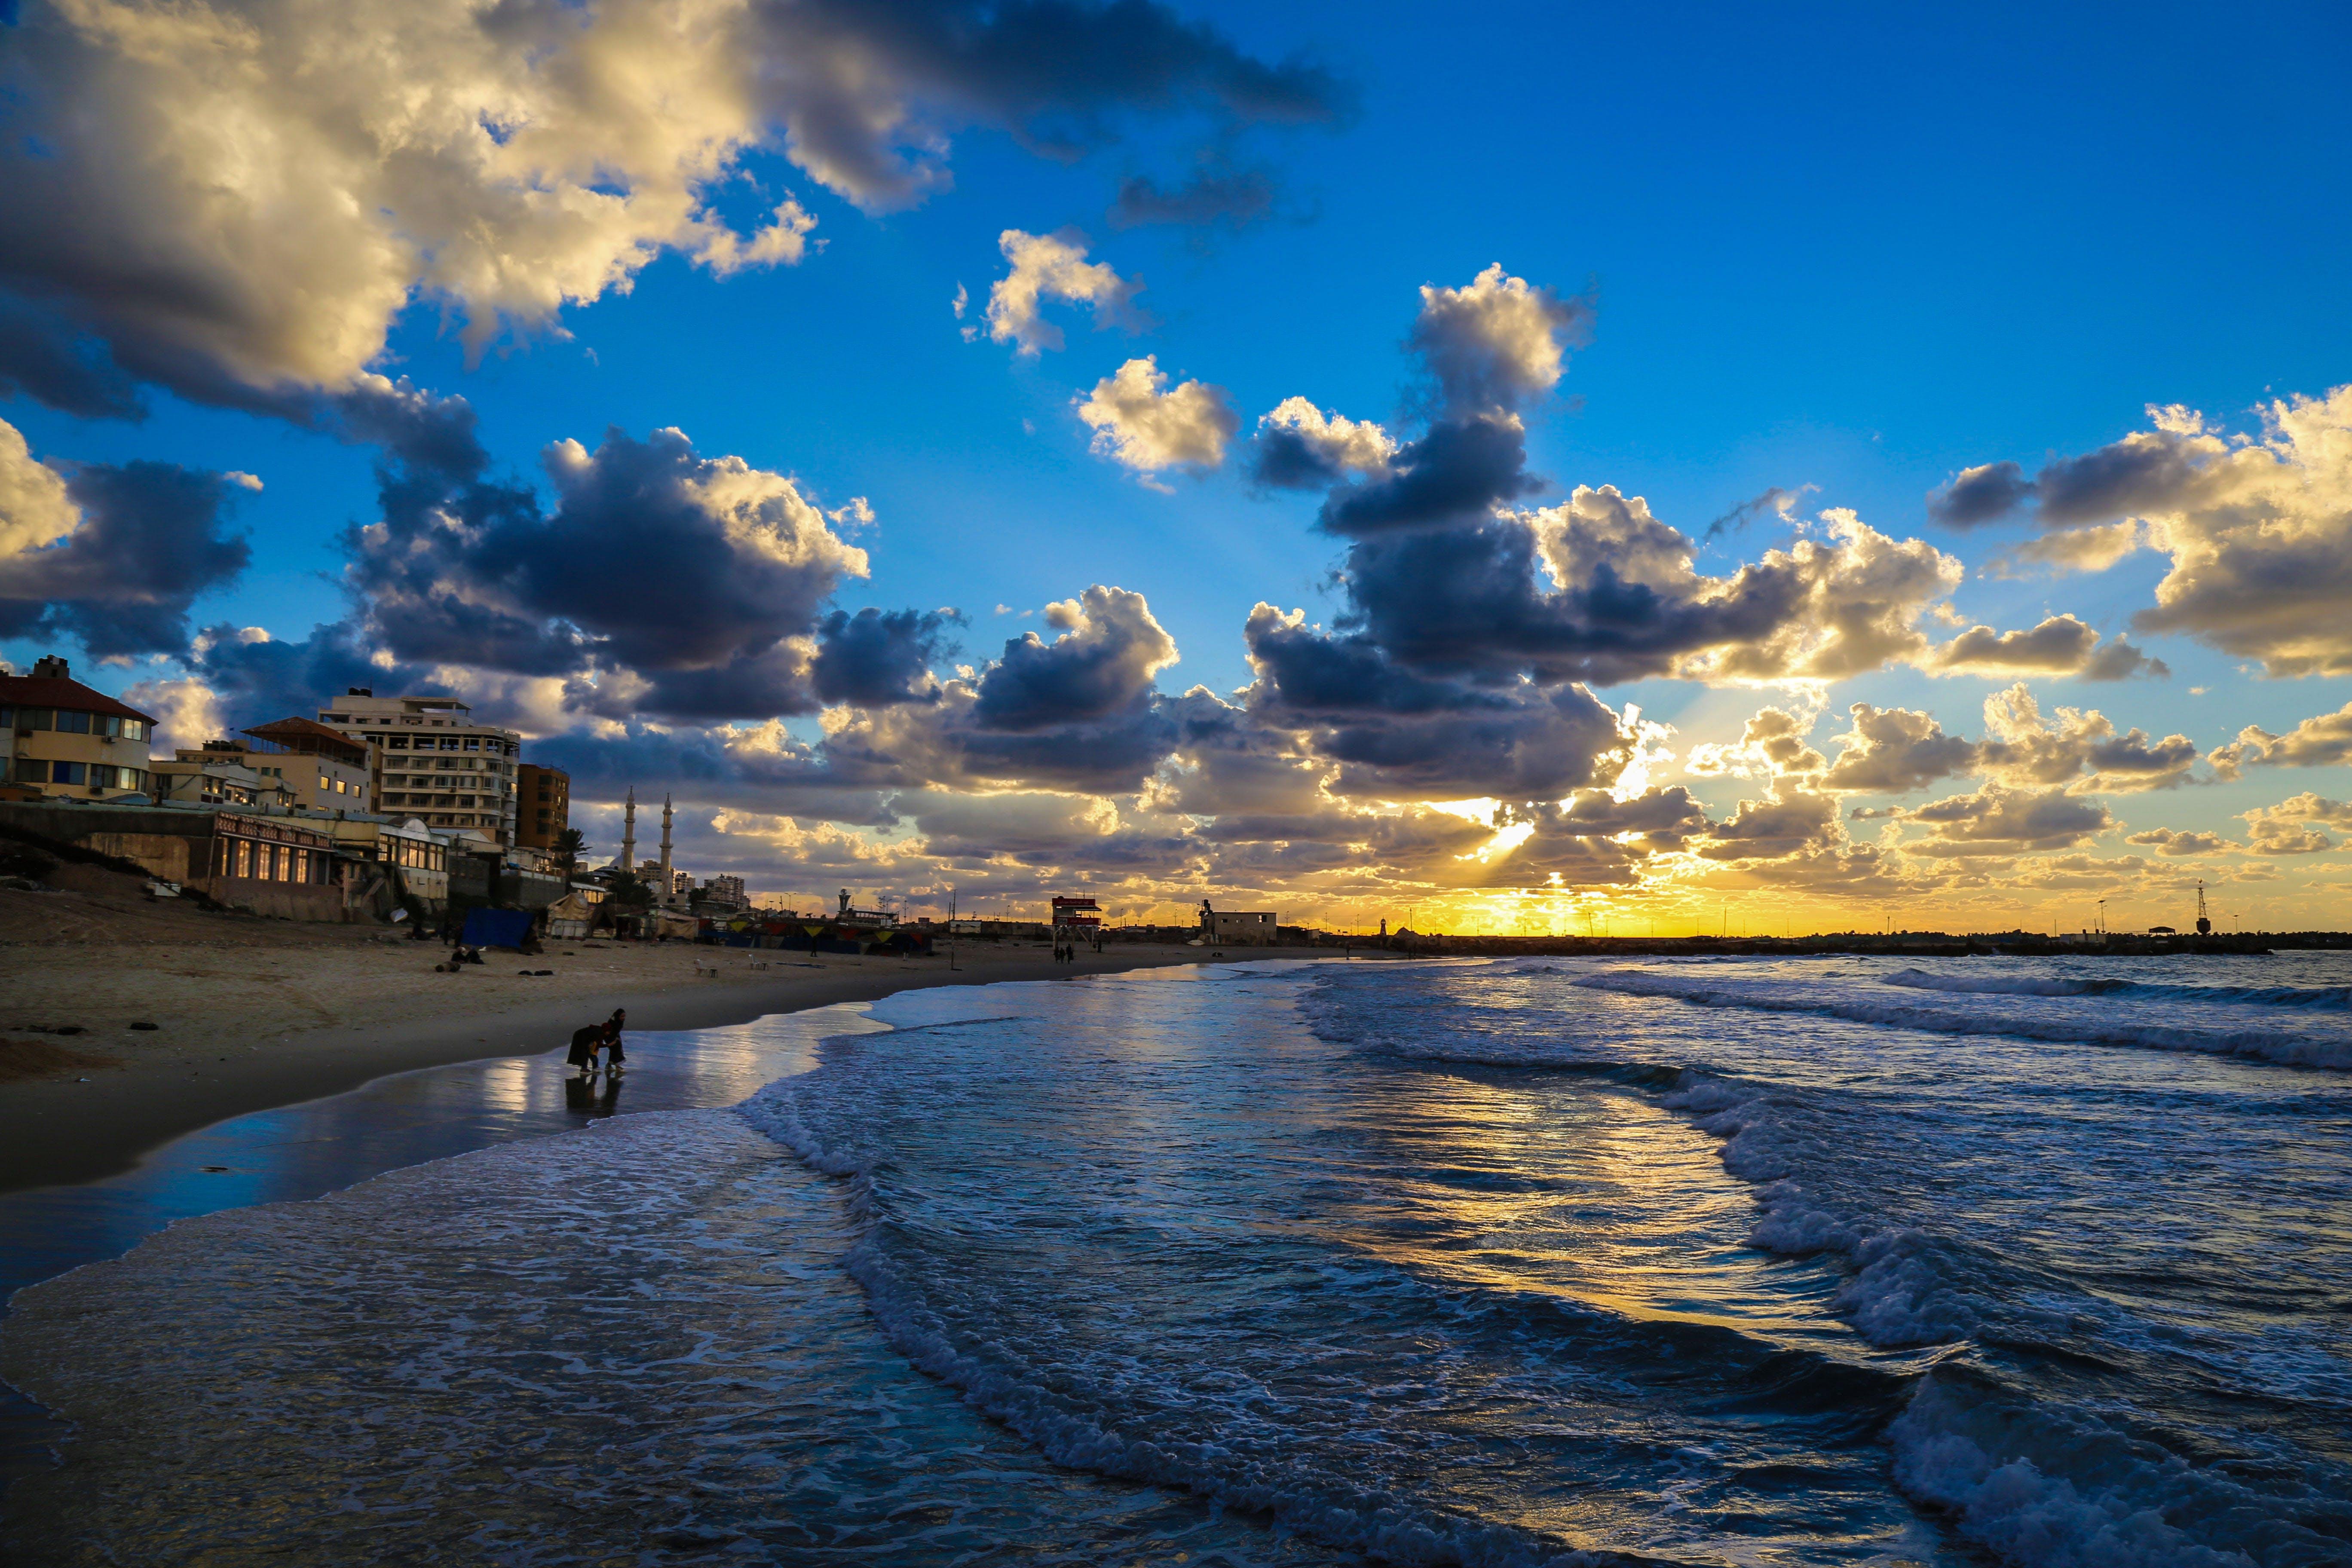 Photography of Seashore During Dusk